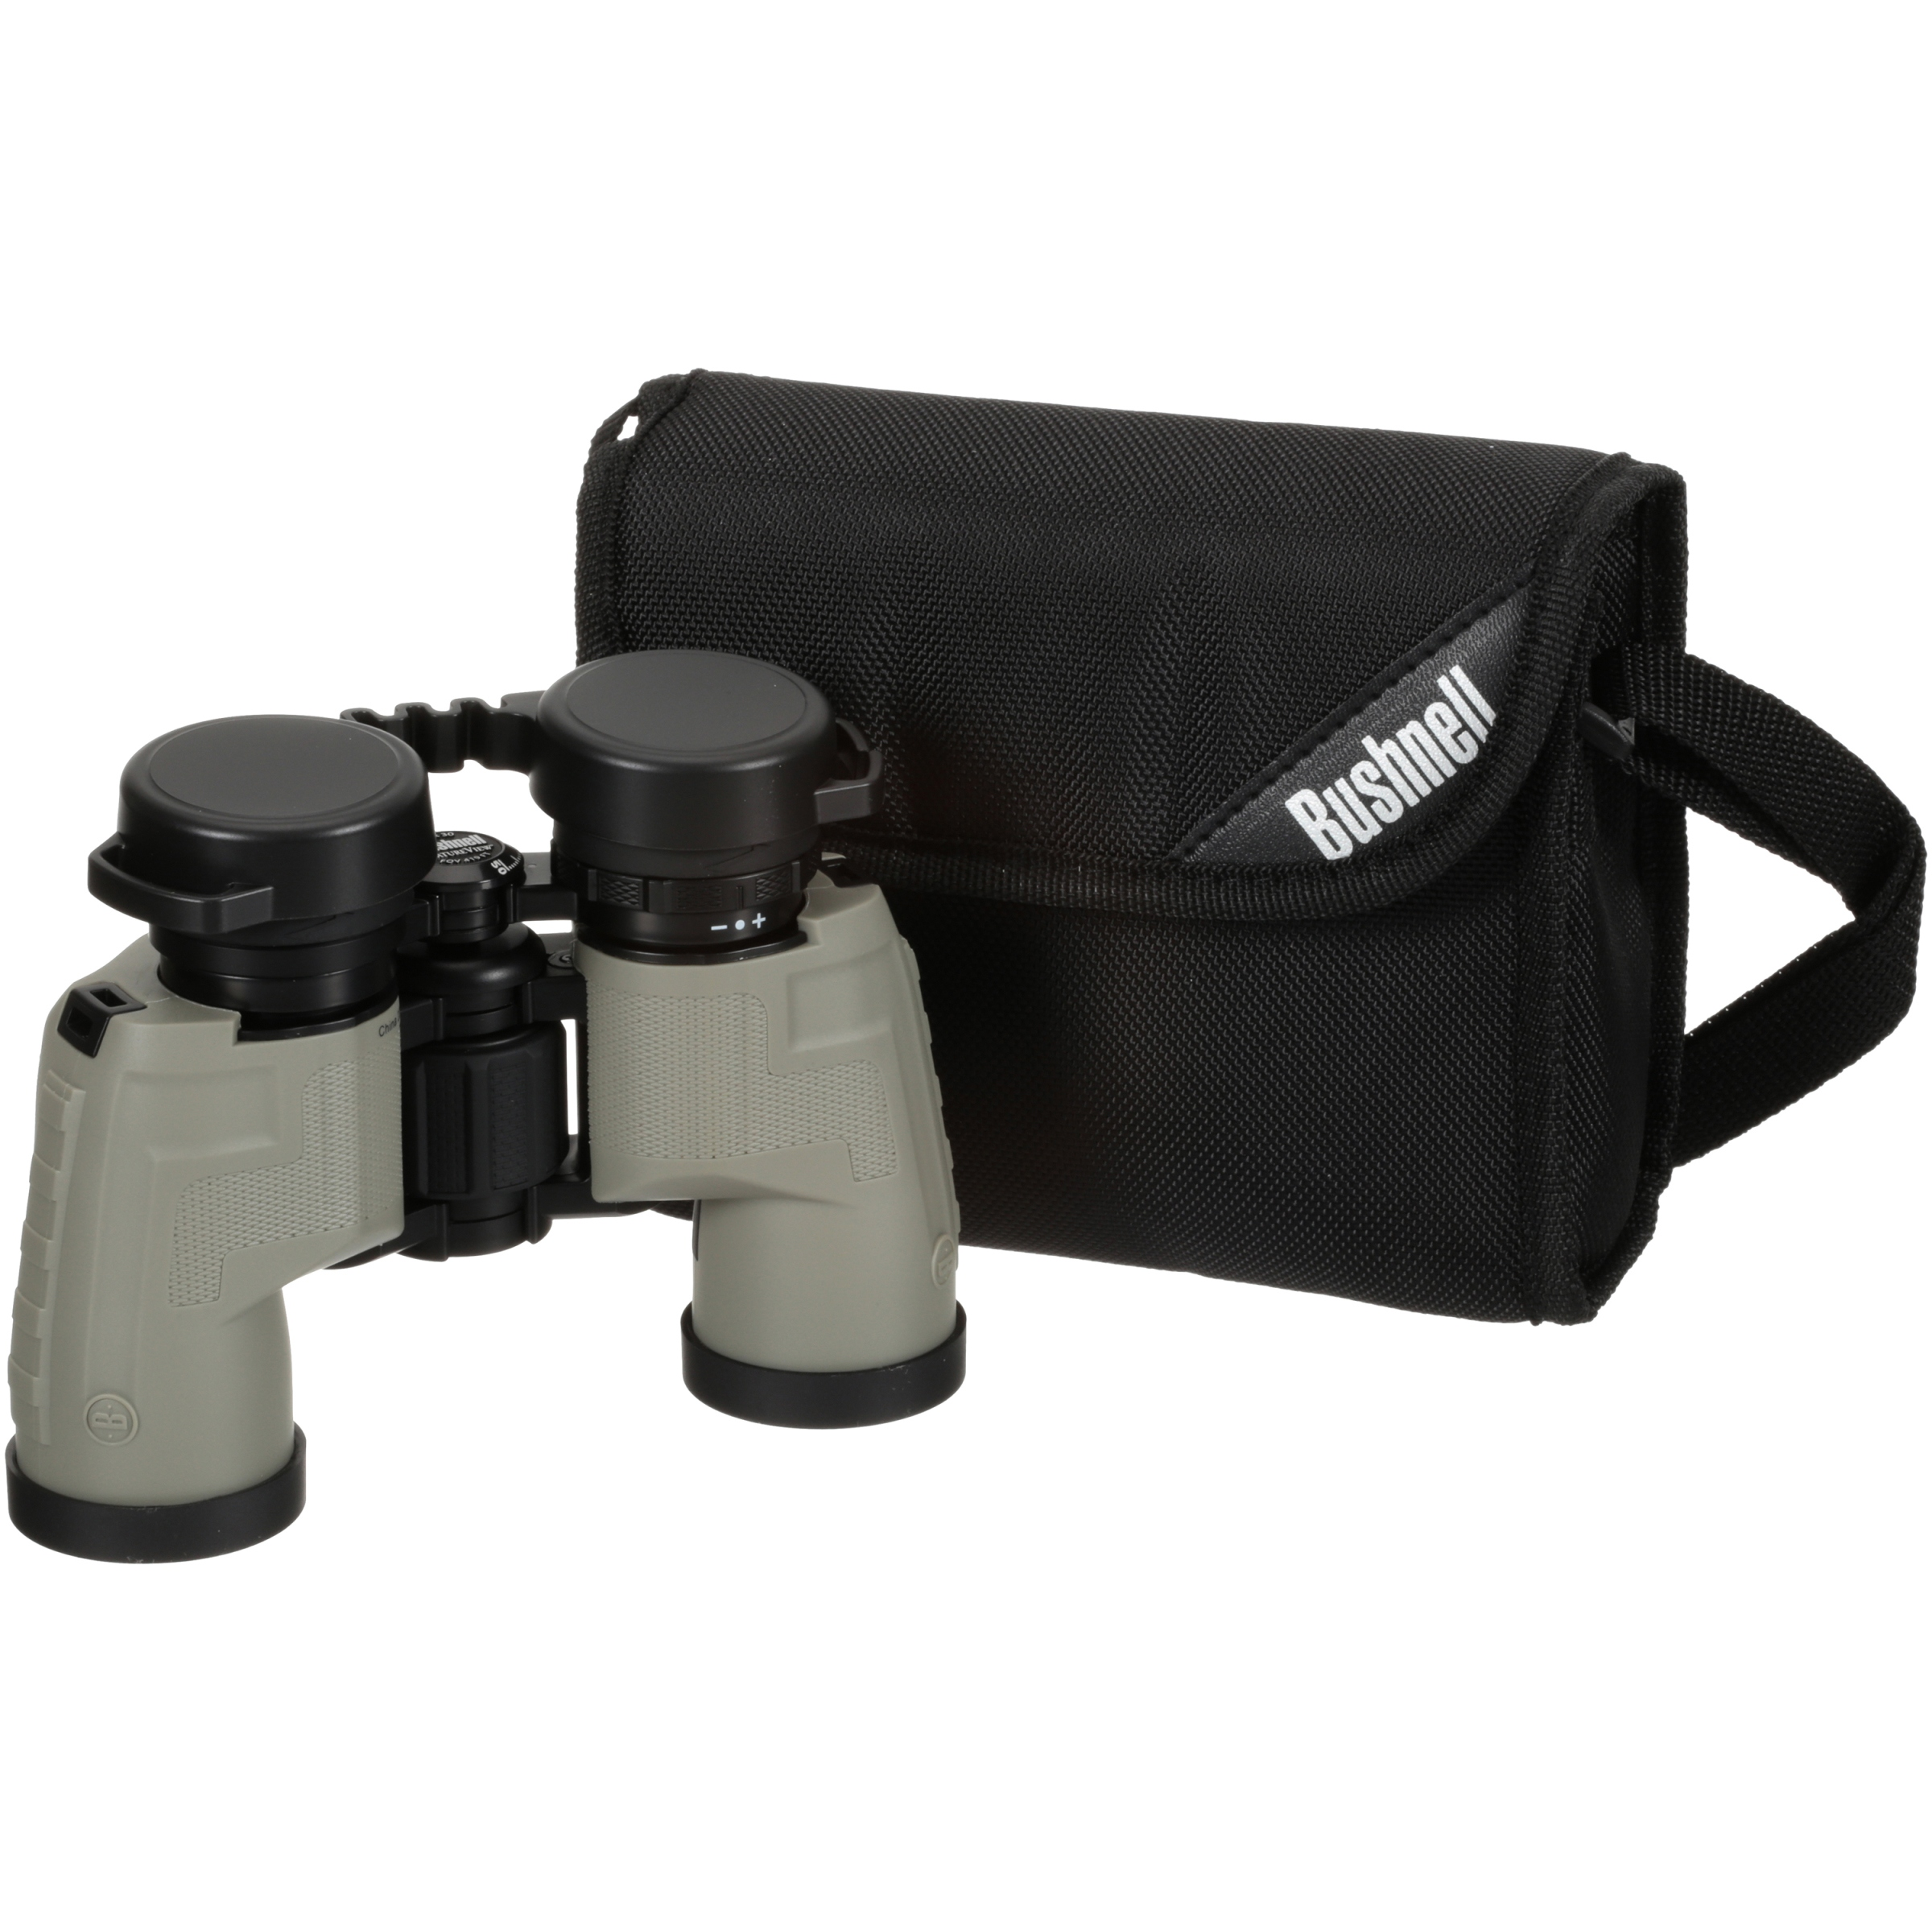 Bushnell 6x30 NatureView Grn Porro,WP, FMC,6 Lan SKU: 220630